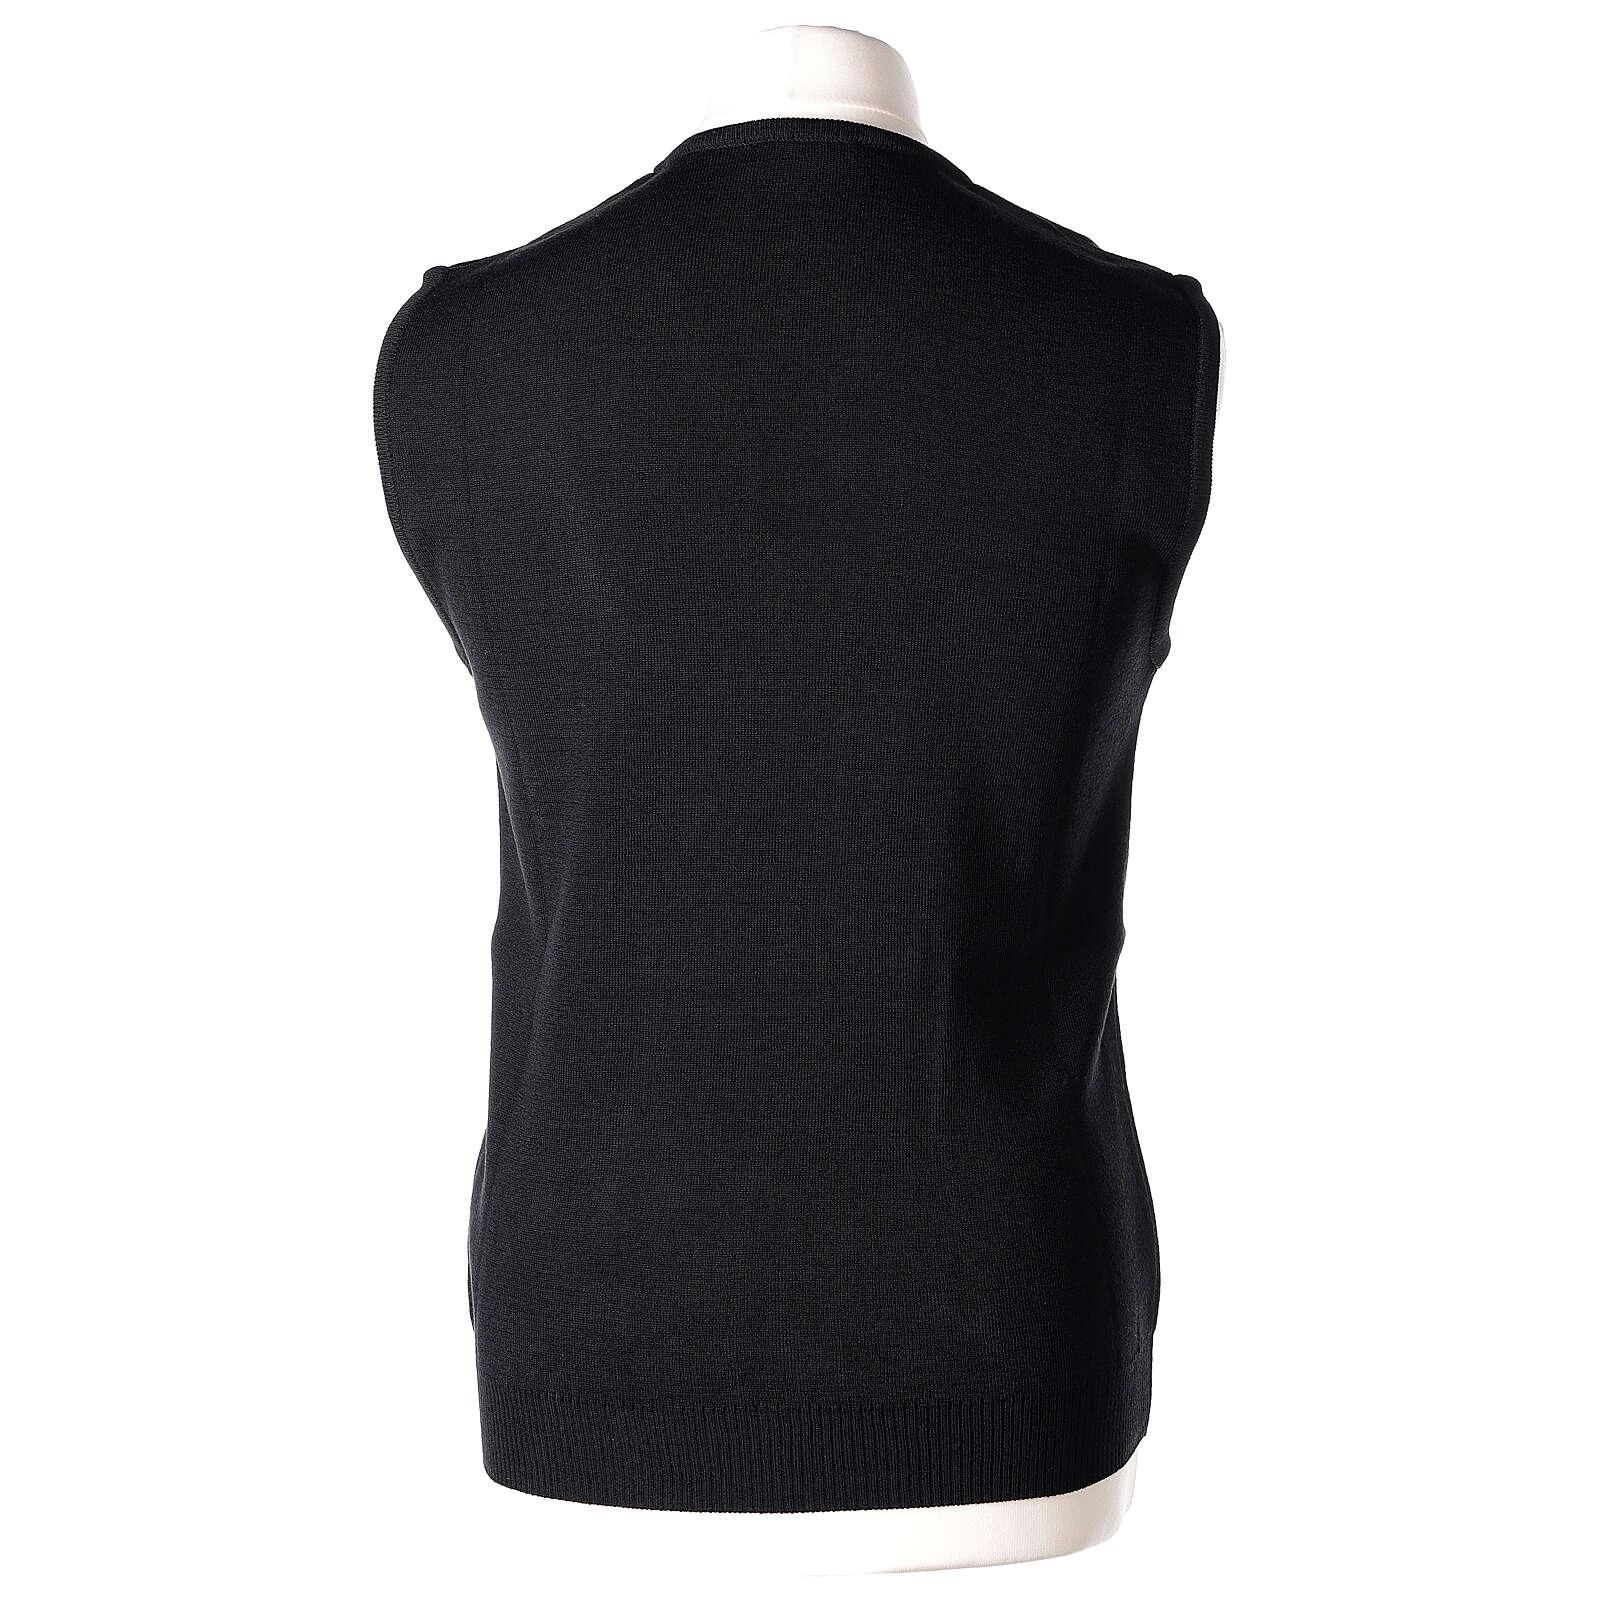 Clergy black sleeveless jumper plain knit 50% merino wool 50% acrylic PLUS SIZES In Primis 4